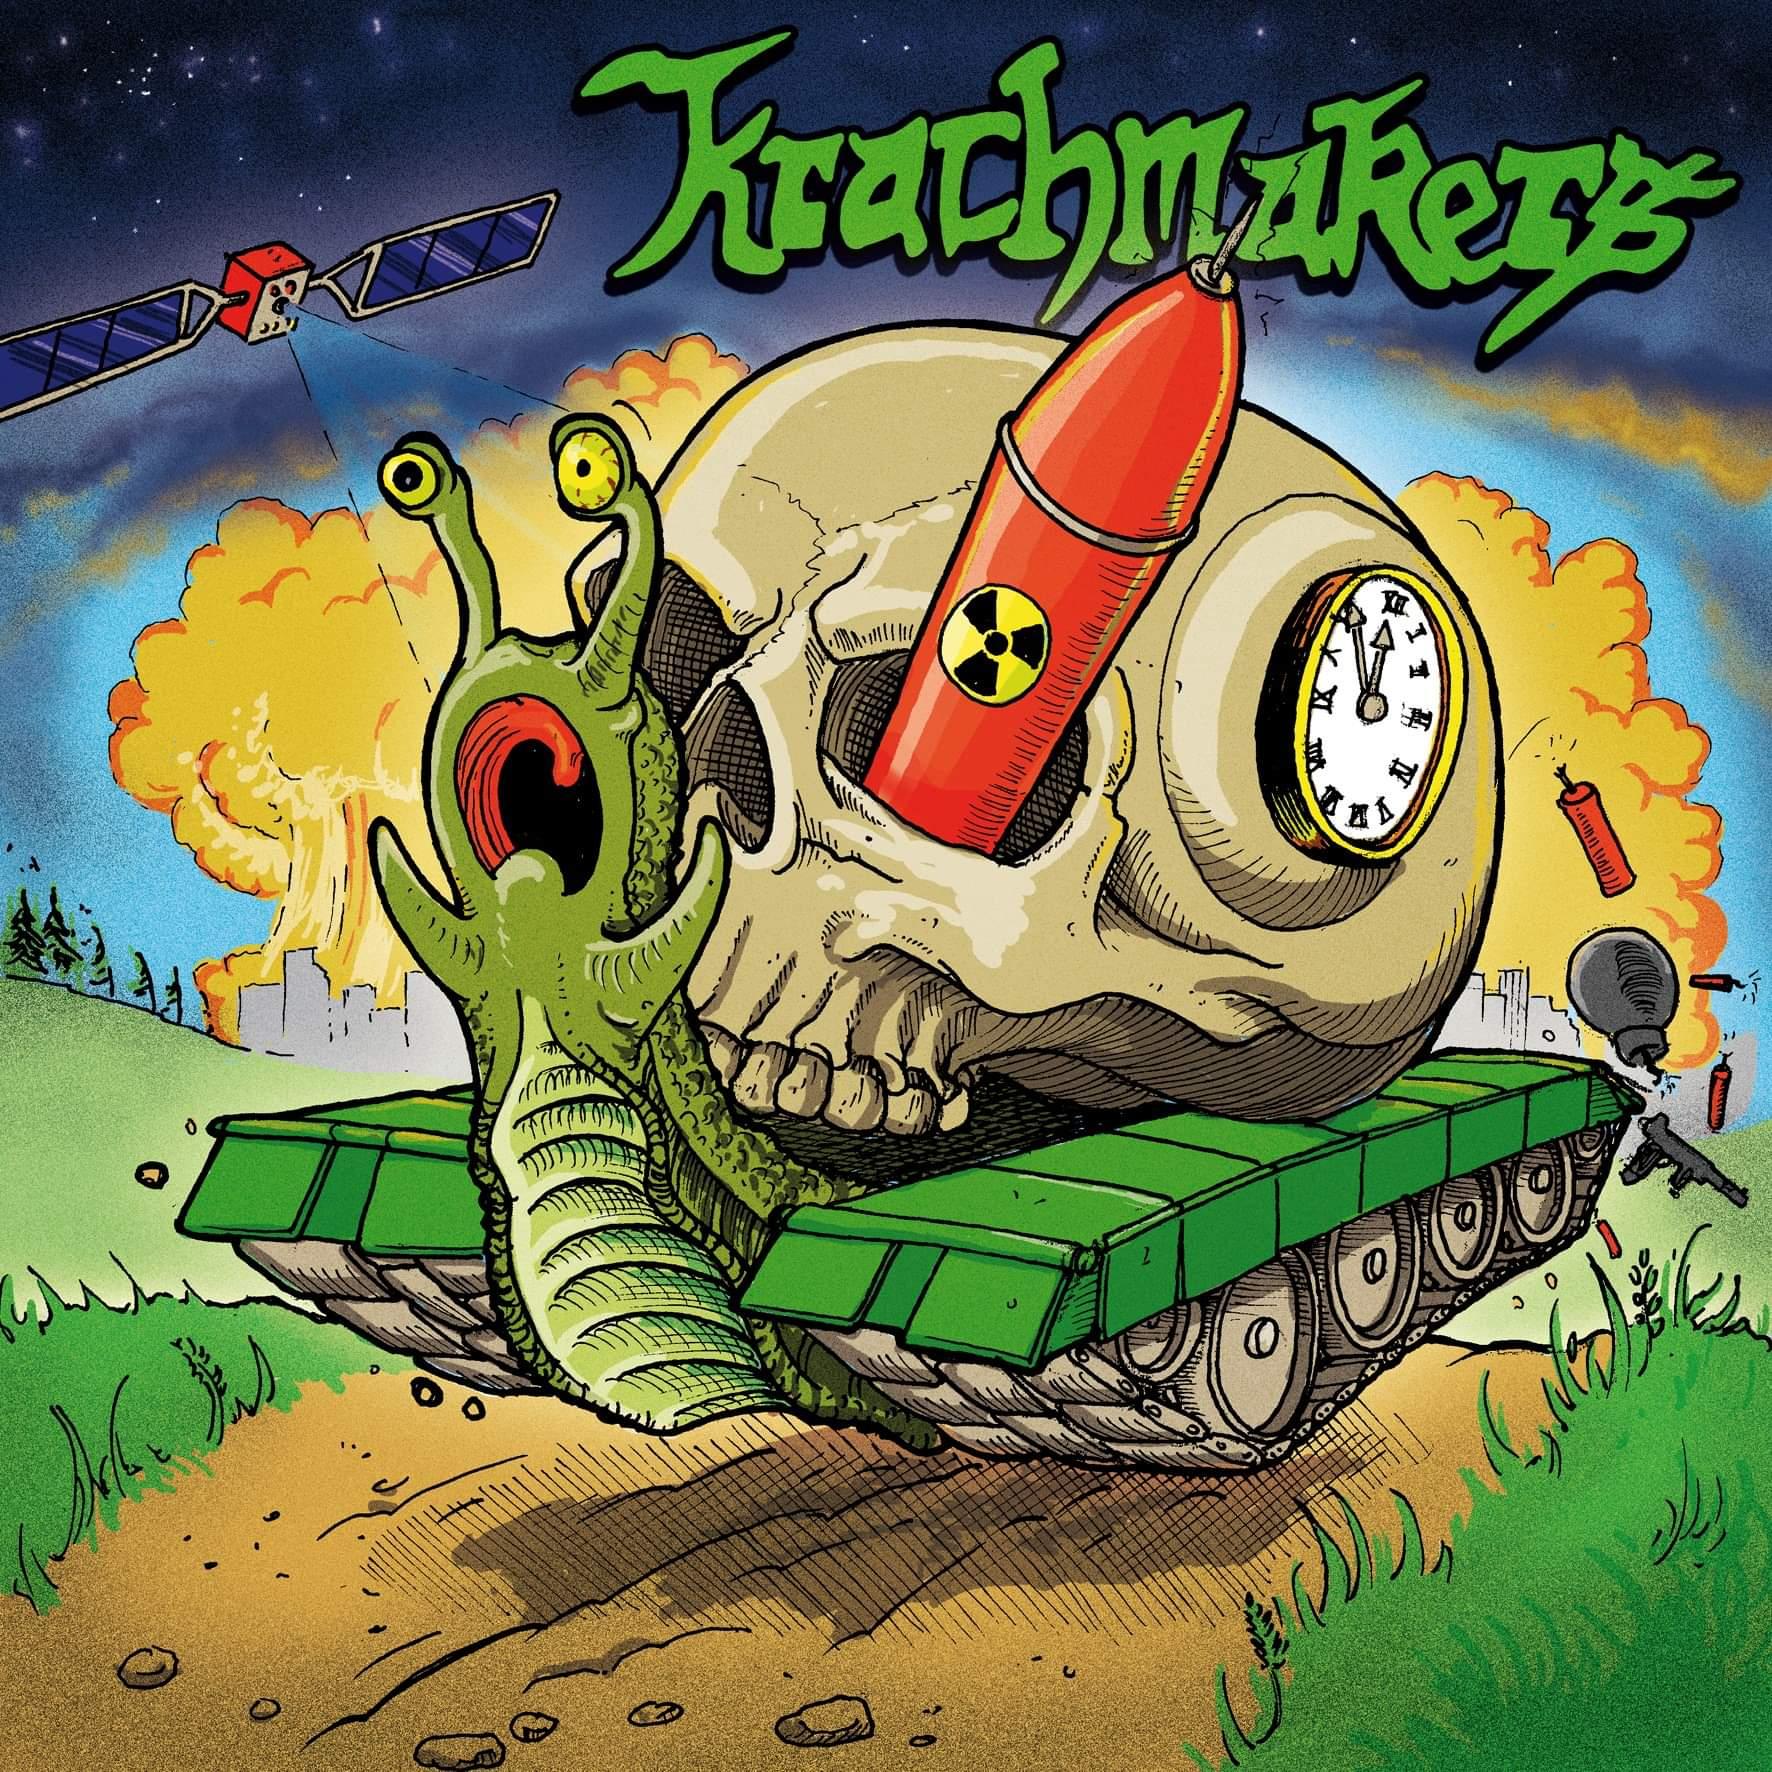 krachmakers-krachmakers-ein-vinyl-review